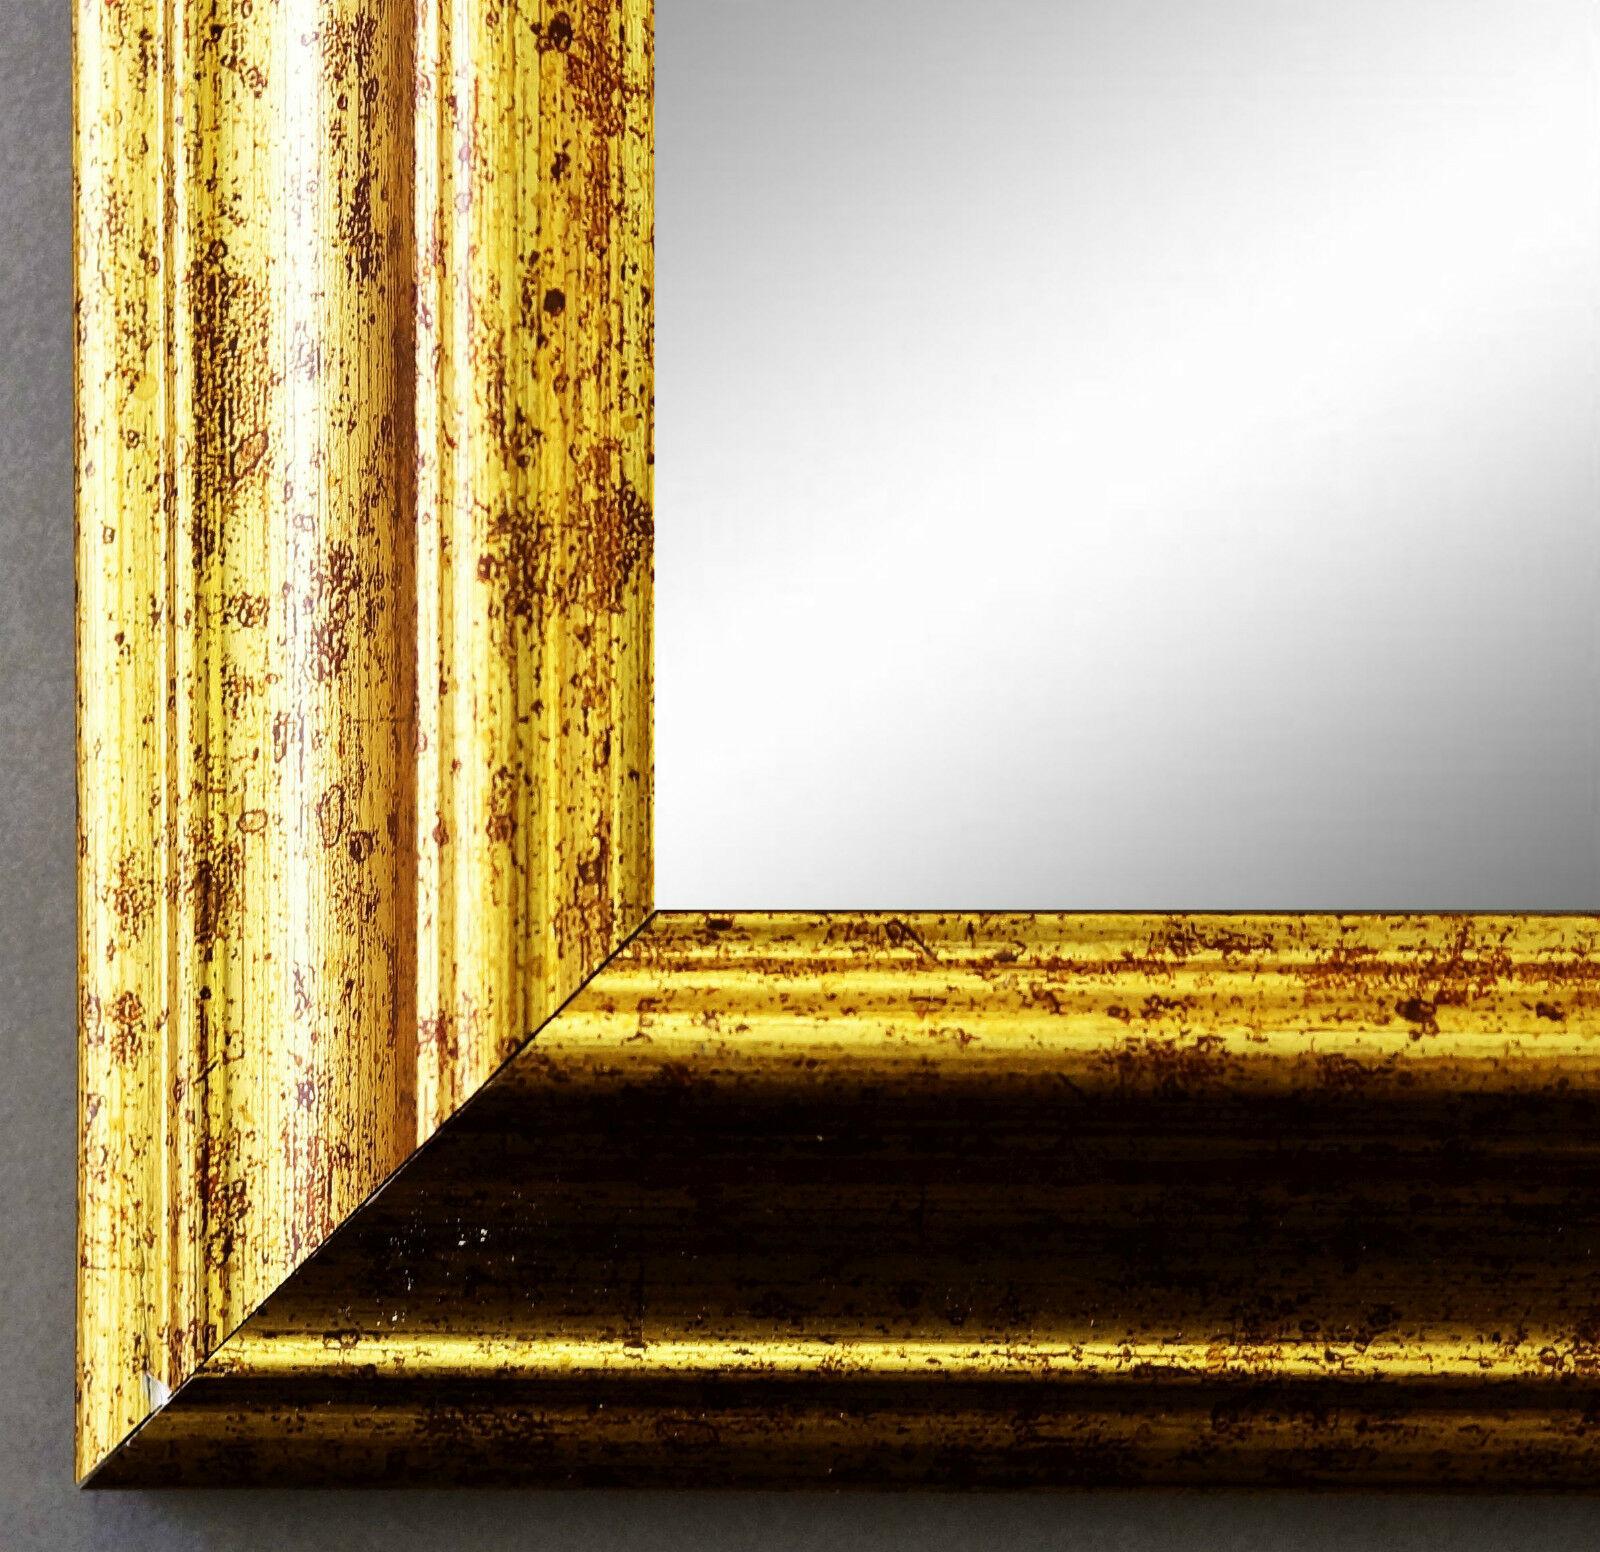 Spiegel gold antik barock wandspiegel badspiegel for Wandspiegel badspiegel